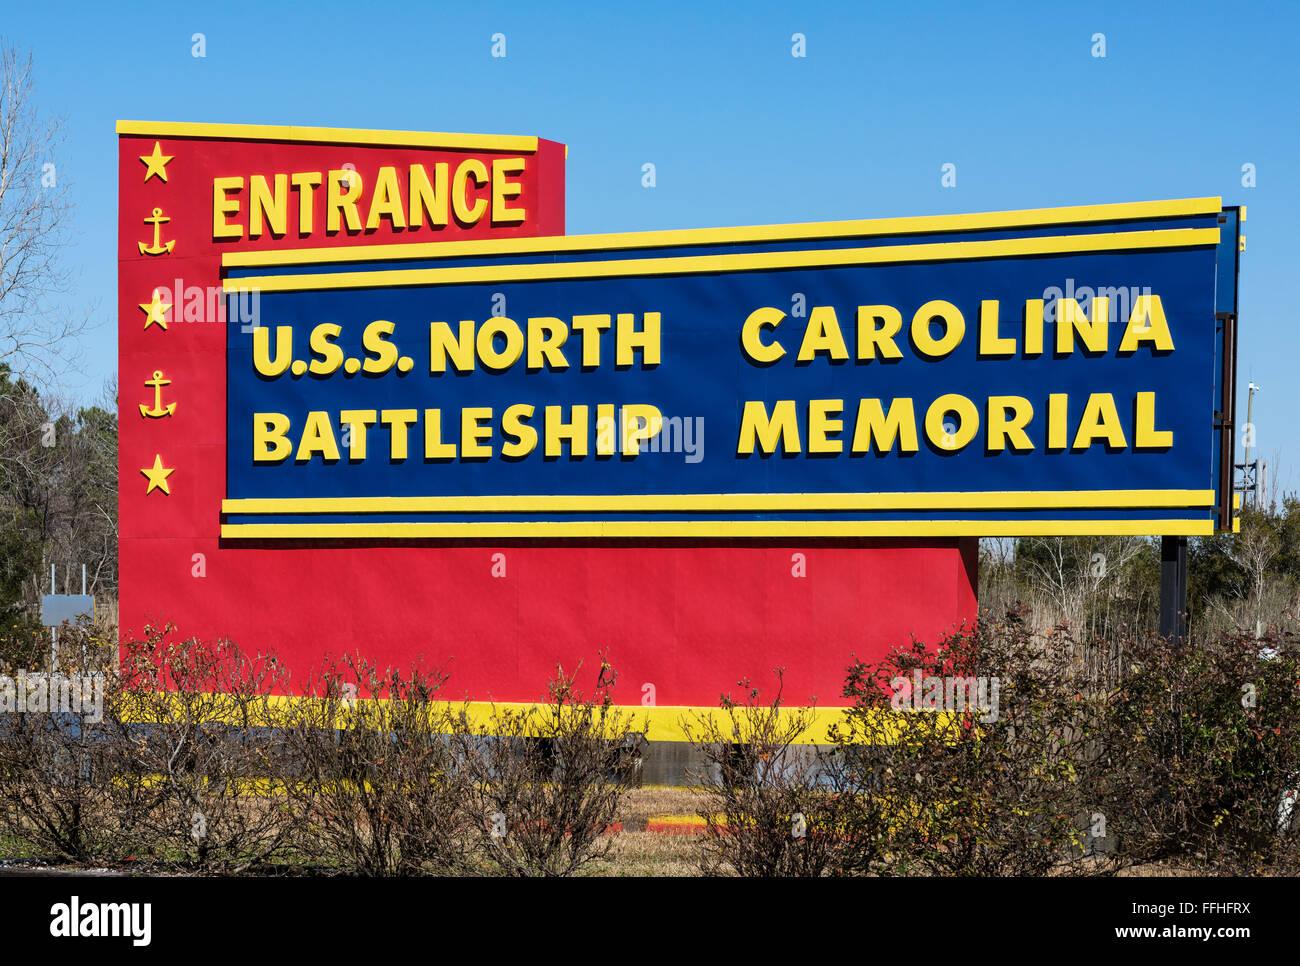 Entrance to the museum battleship USS North Carolina, Wilmington, North Carolina, USA - Stock Image